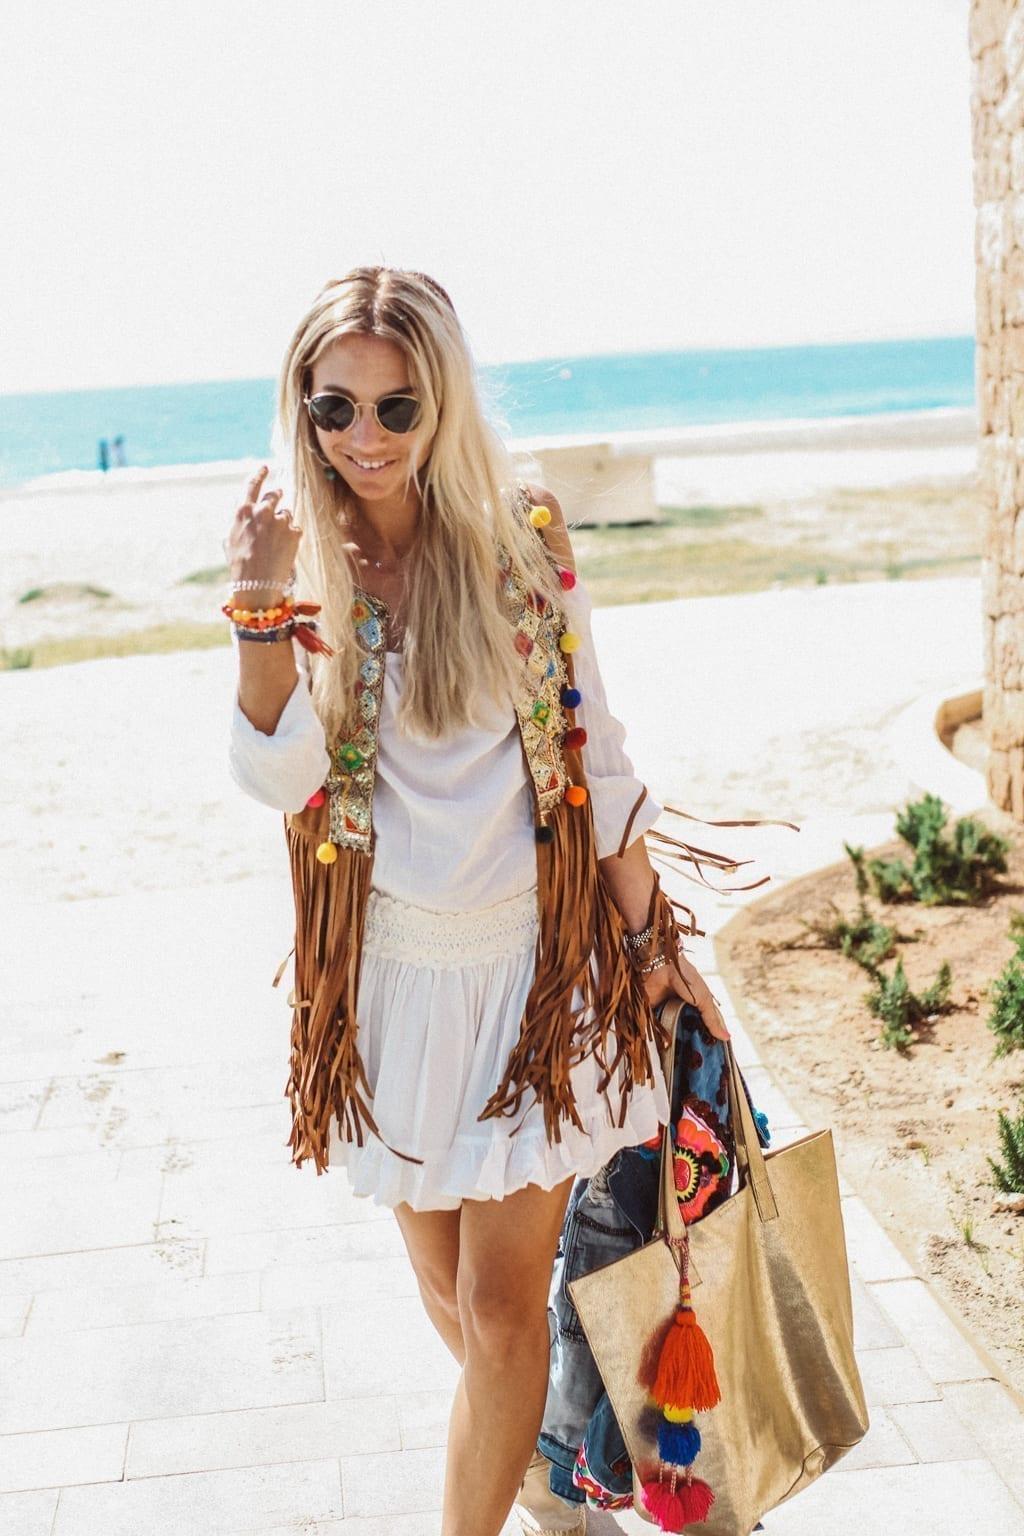 CK1605_Constantly-K-Karin-Kaswurm-Georg-Teigl-Ibiza-Holiday-Spain-Blog-Street-Style-Fashion-Boho-Chic-Beach-Style-7733